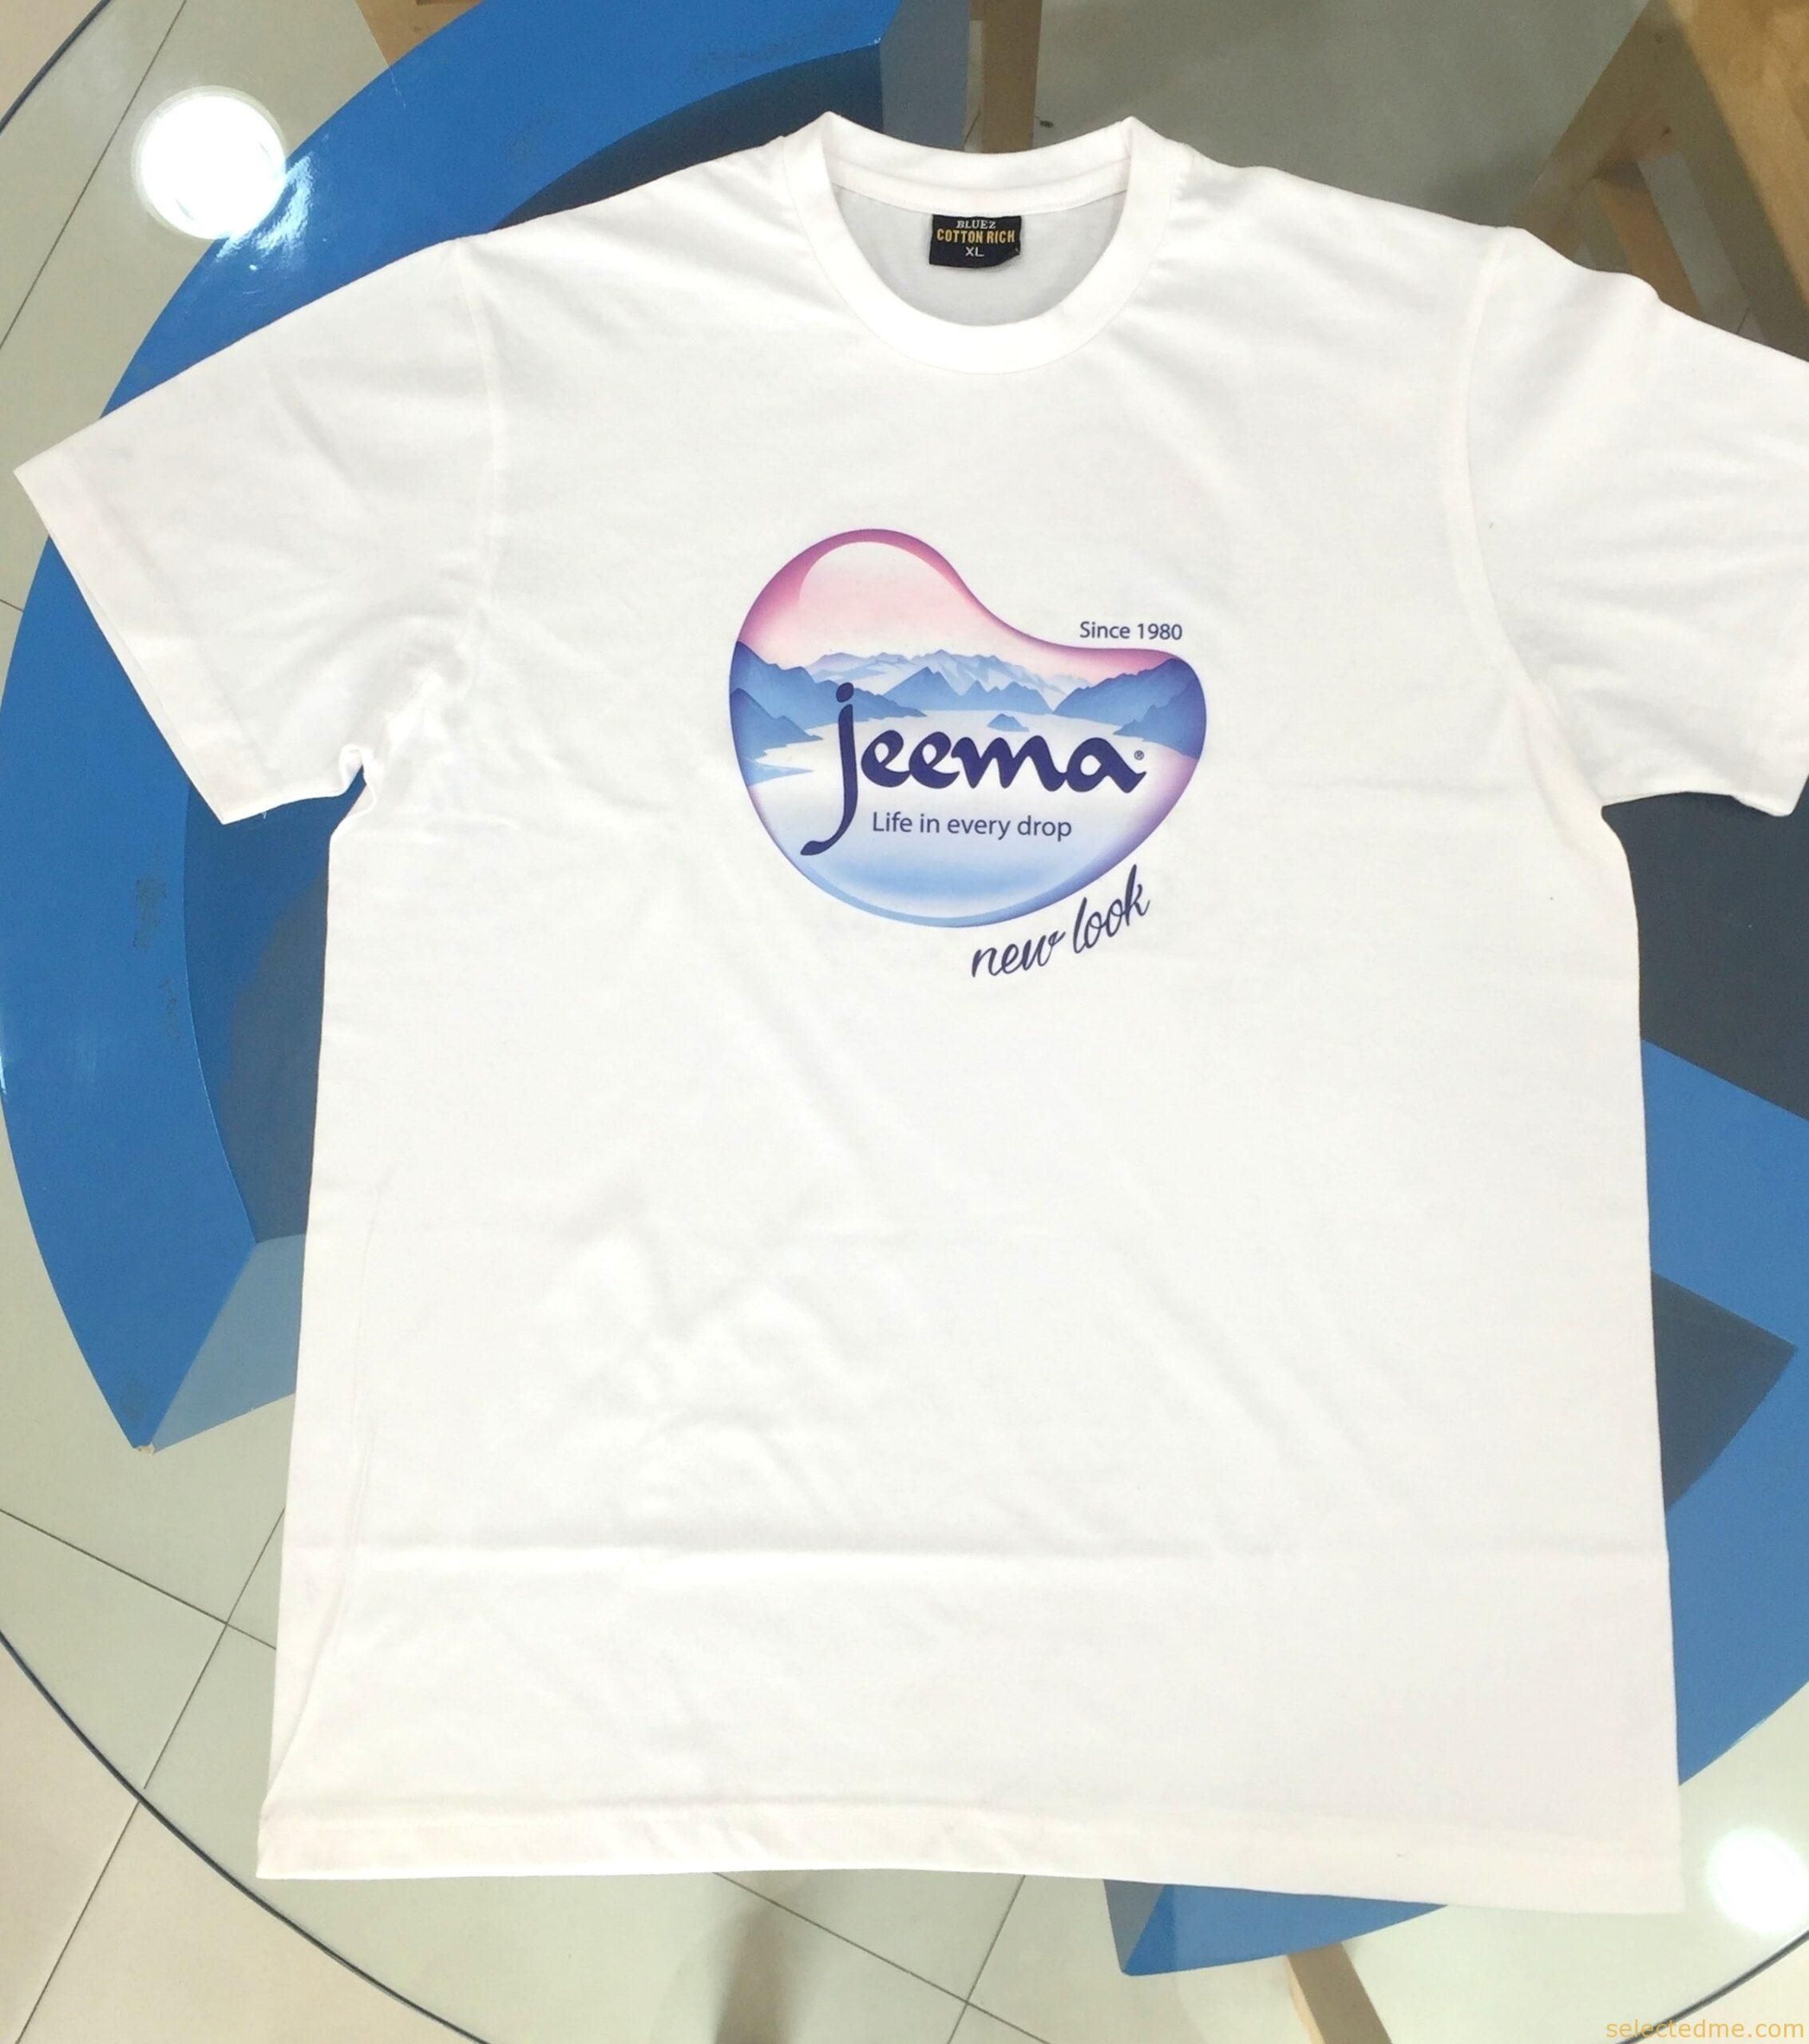 T-shirts printing Dubai - Personalized Tshirts with screen printing, sublimation printing in UAE